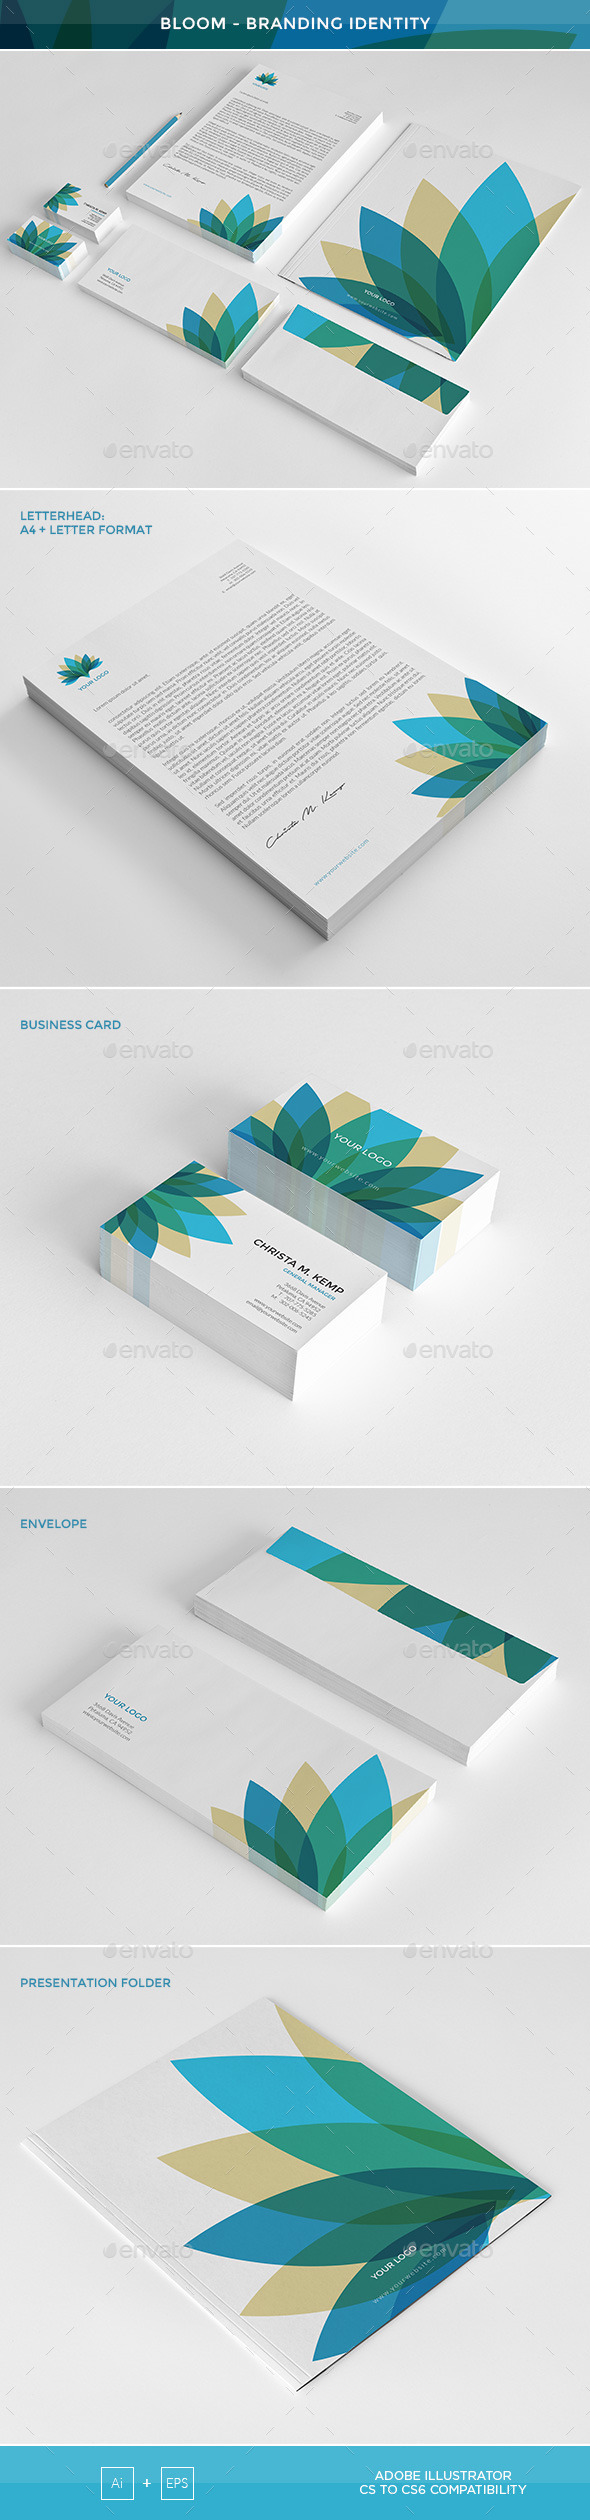 GraphicRiver Bloom Branding Identity 11776441